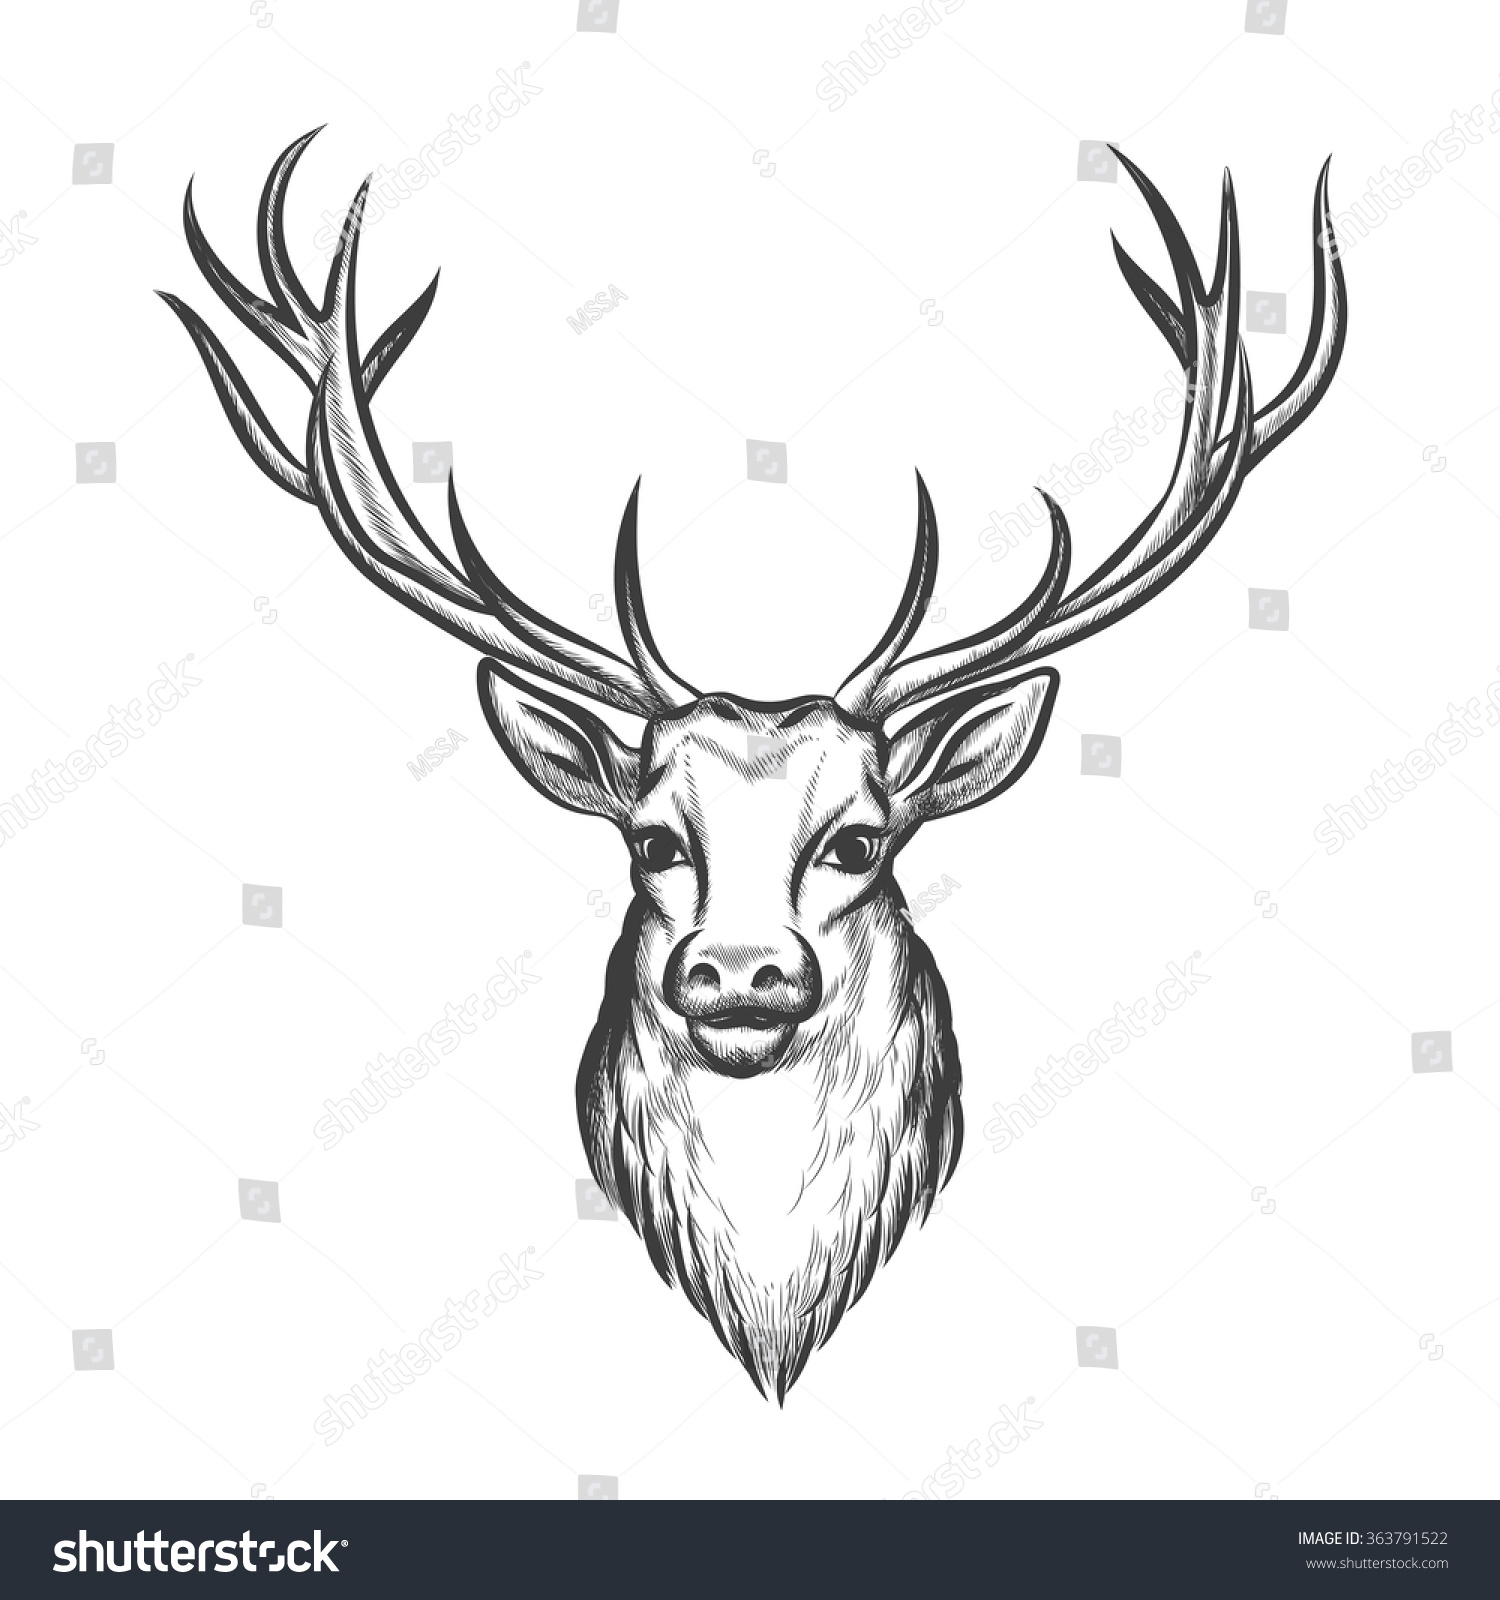 Reindeer Face Line Drawing : Hand drawn deer head wild animal stock vector